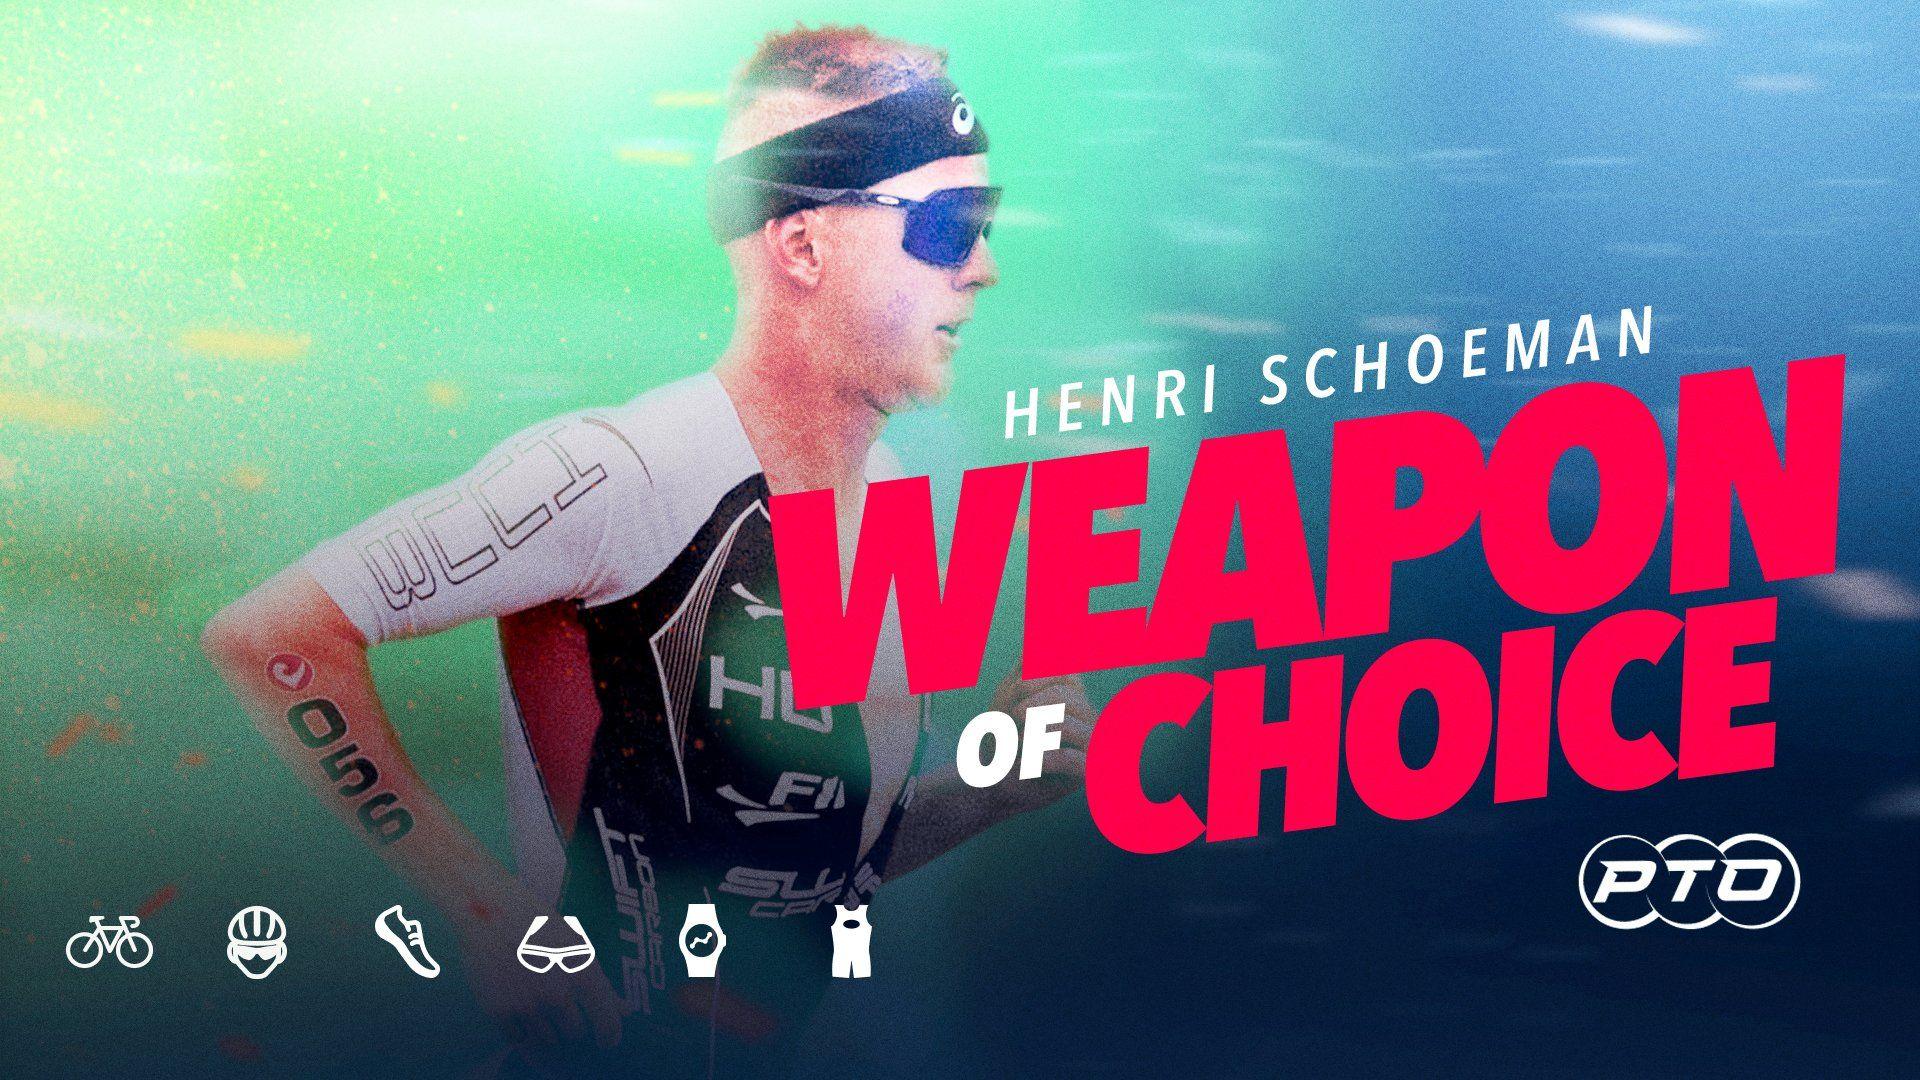 Weapon of Choice || Henri Schoeman